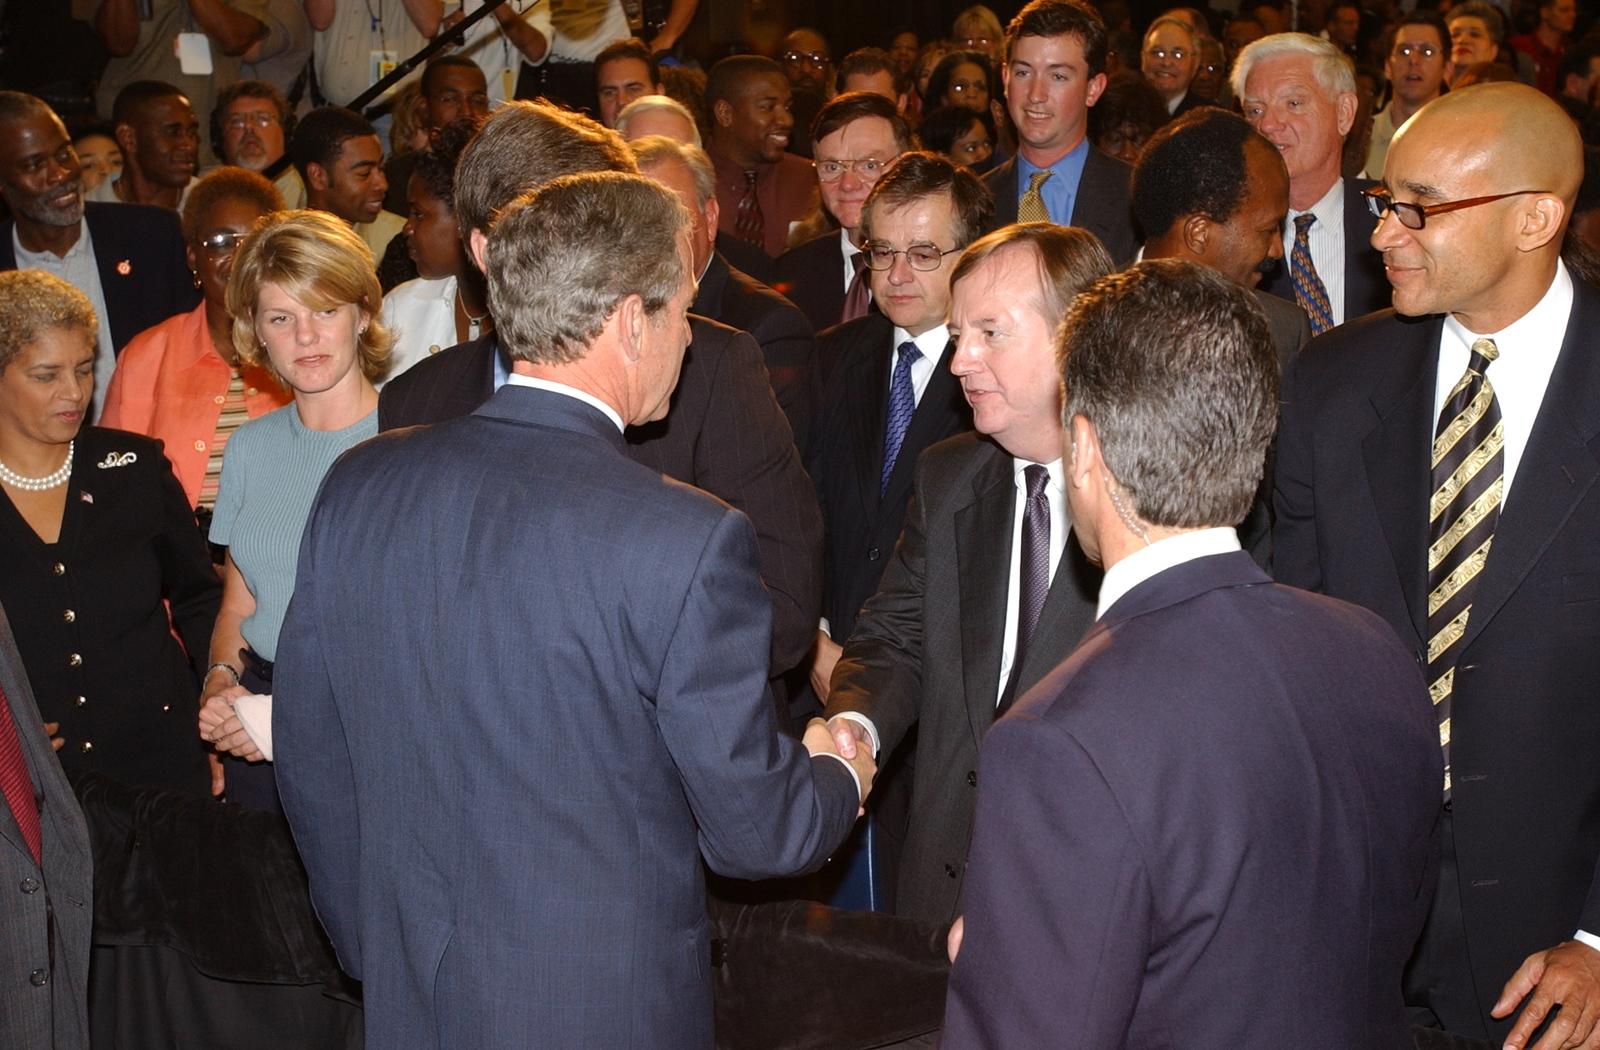 Secretary Mel Martinez,  [Deputy Secretary Alphonso Jackson, other HUD officials visiting]  Atlanta, Georgia,  where they joined President George W. Bush at events celebrating Homeownership Month